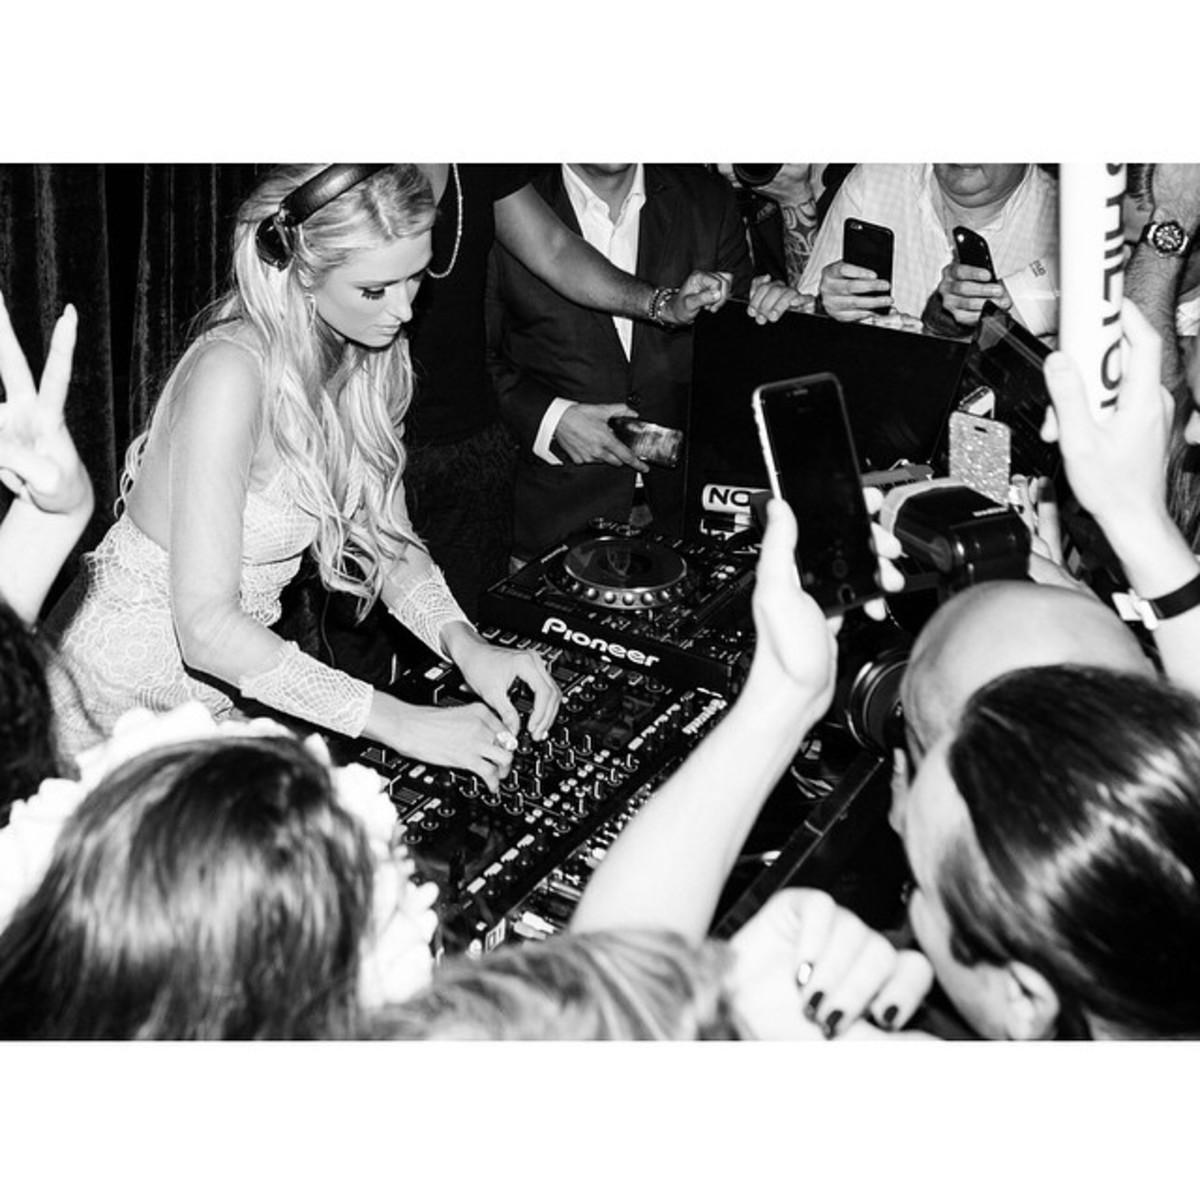 Paris Hilton Seen In Miami With Bags Of Money, DJs